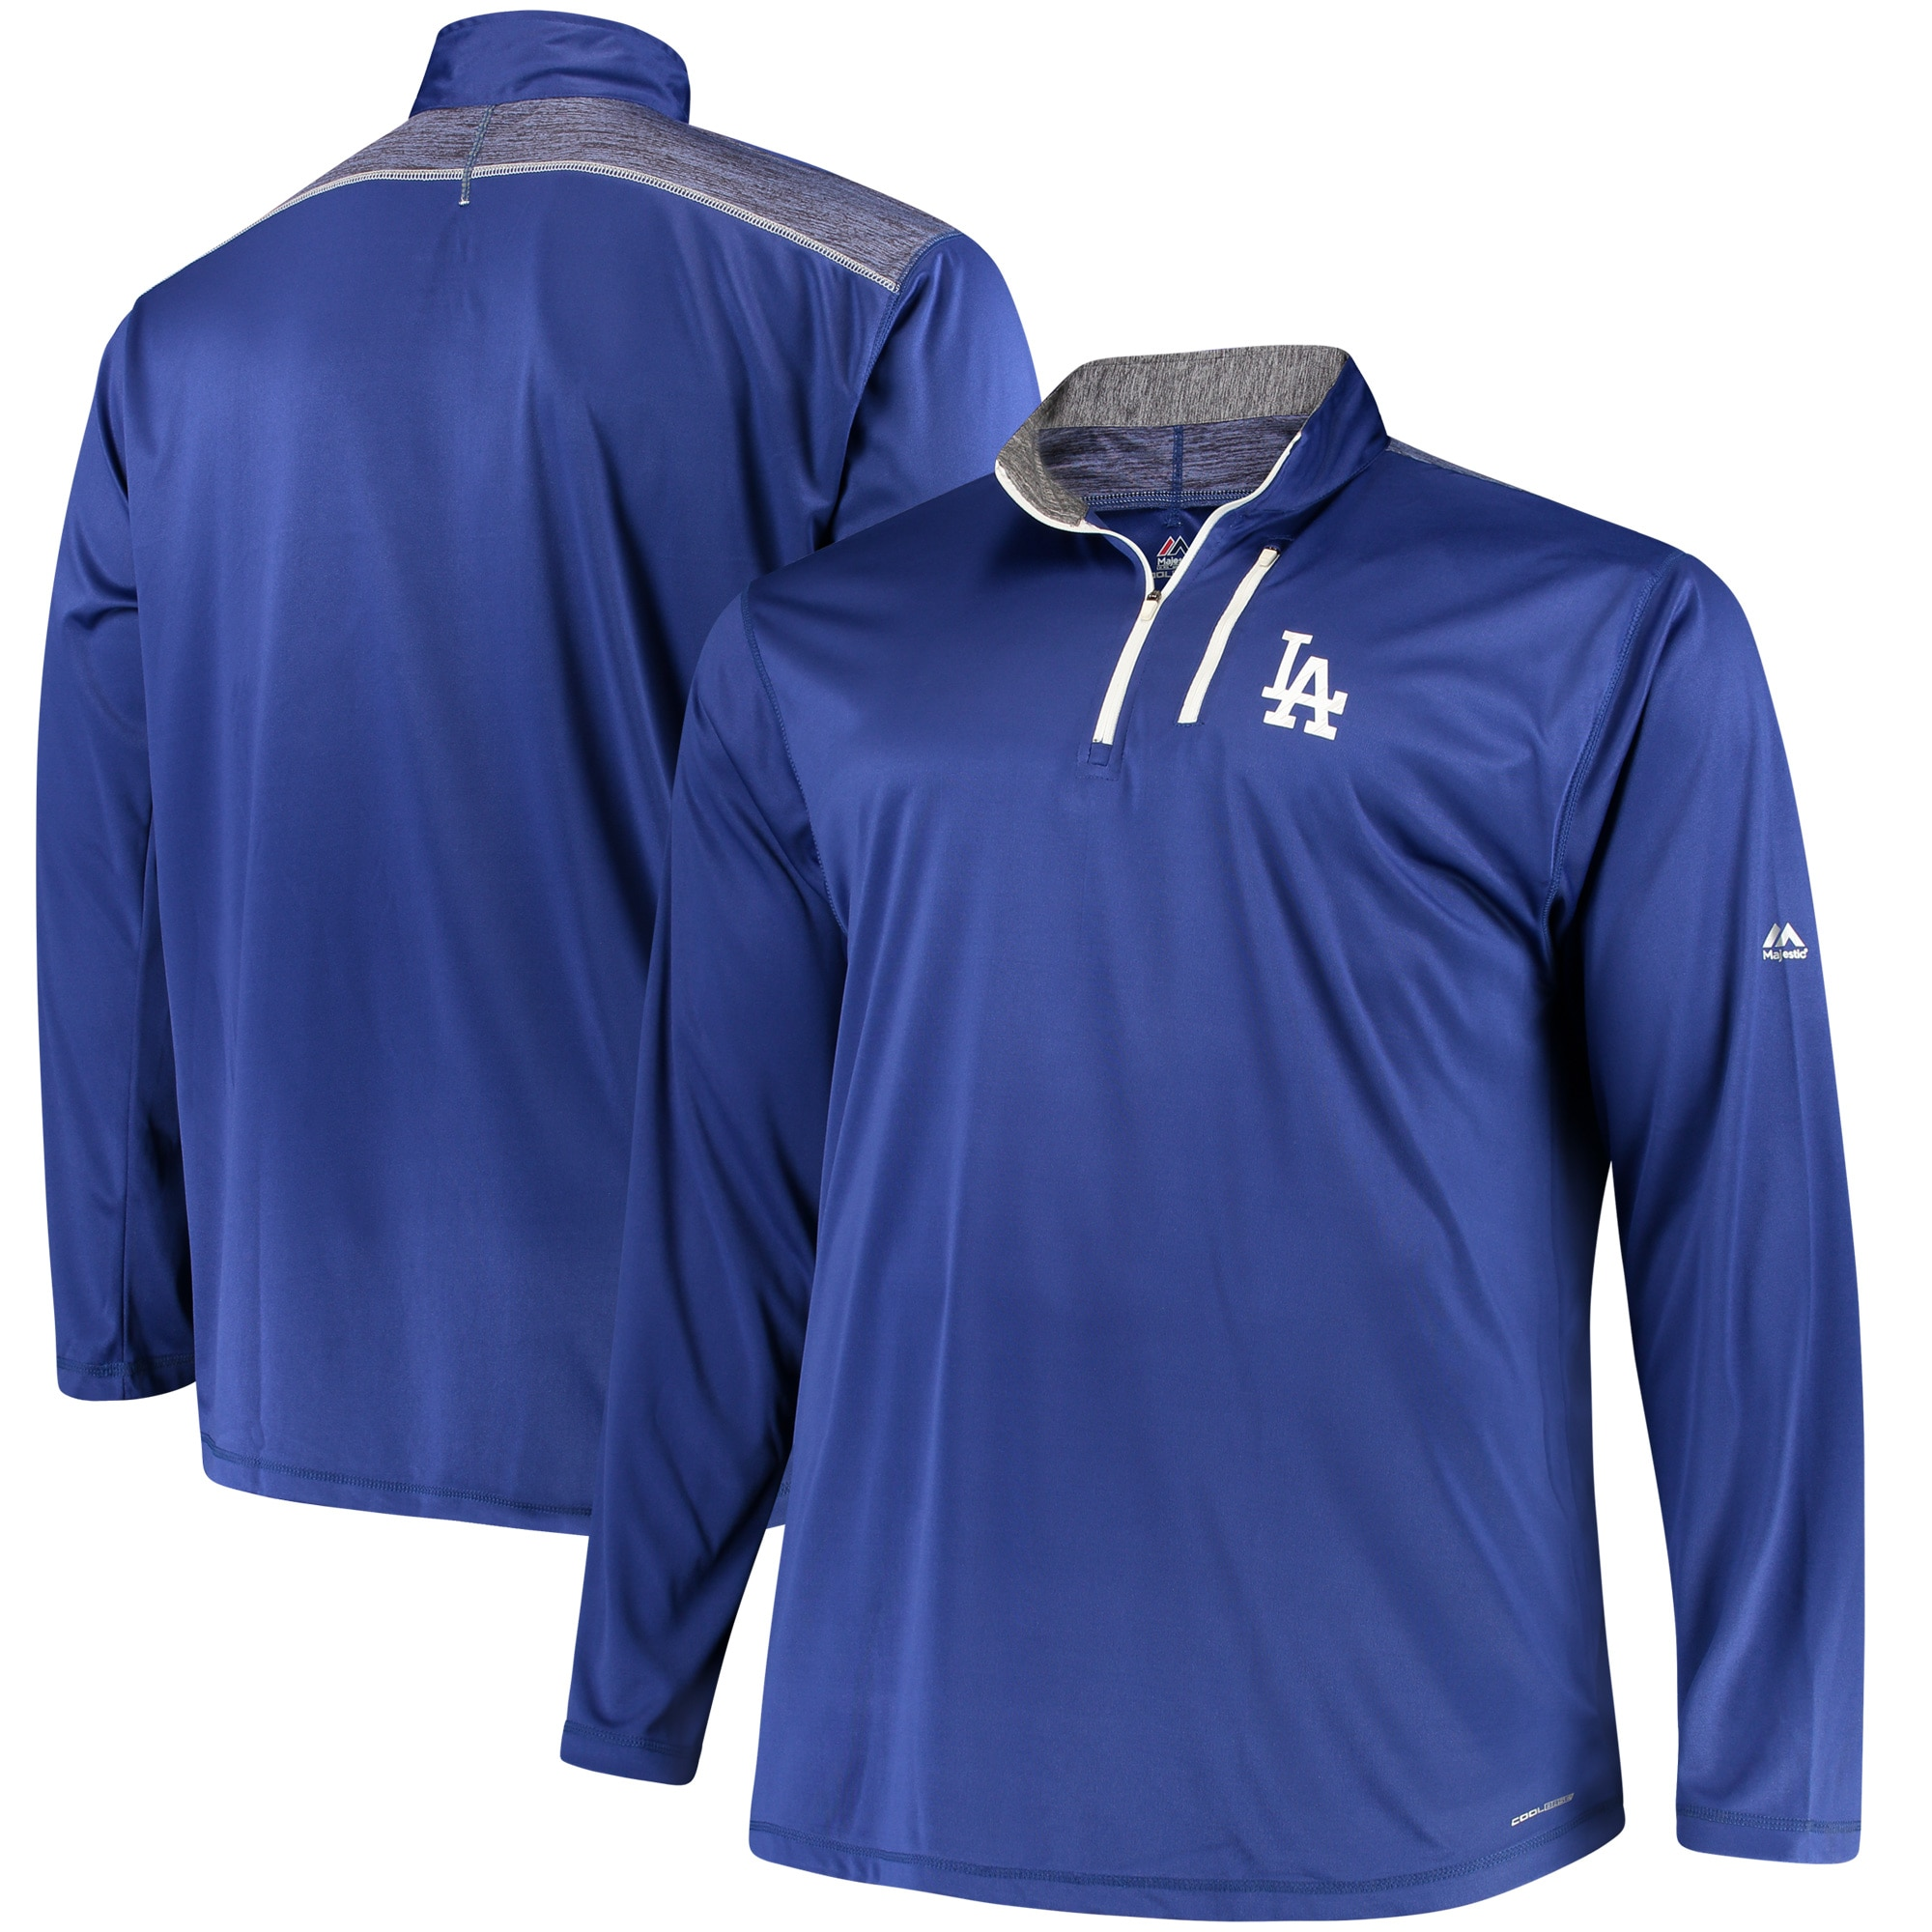 Los Angeles Dodgers Majestic Big & Tall 643 Half-Zip Pullover Jacket - Royal